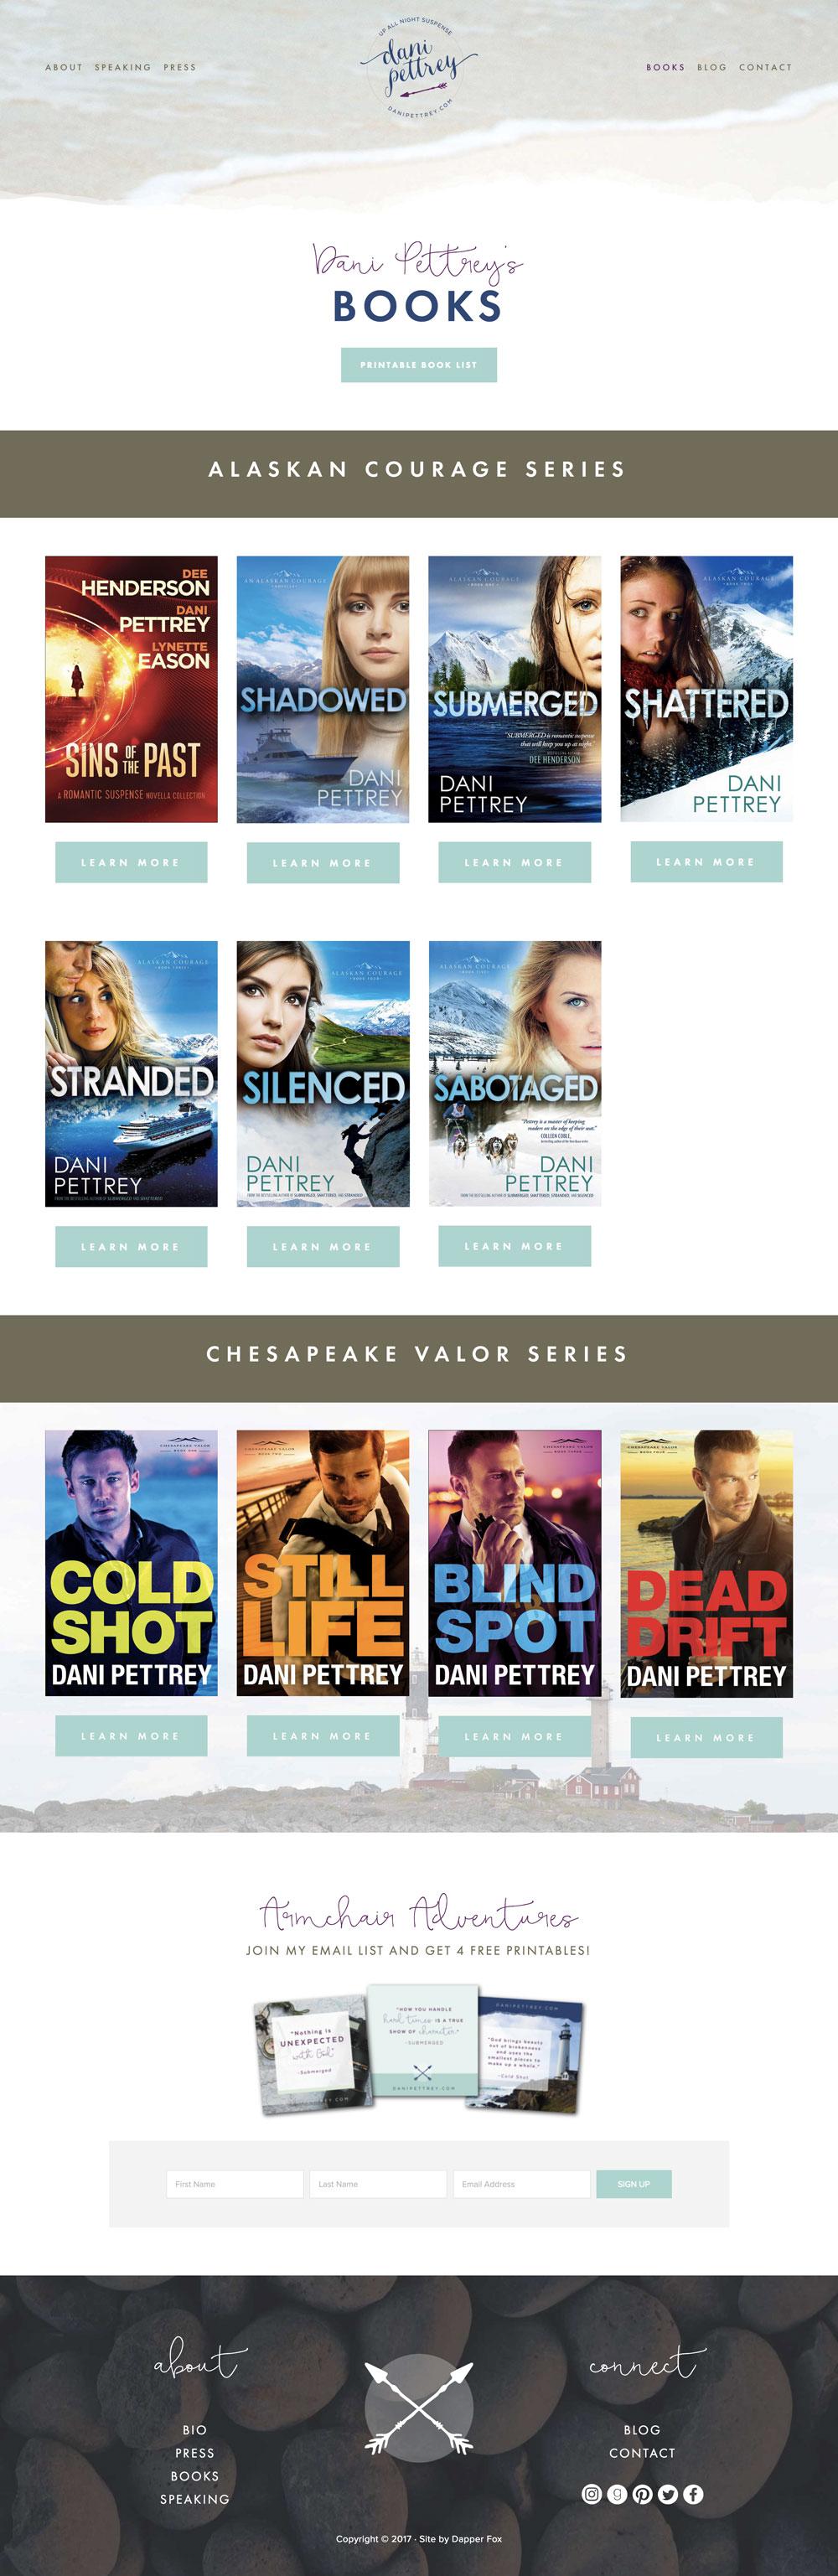 Dani Pettrey Book Author Wordpress Website and  Branding Design #Coastal #Beach #Ocean #Design #Modern